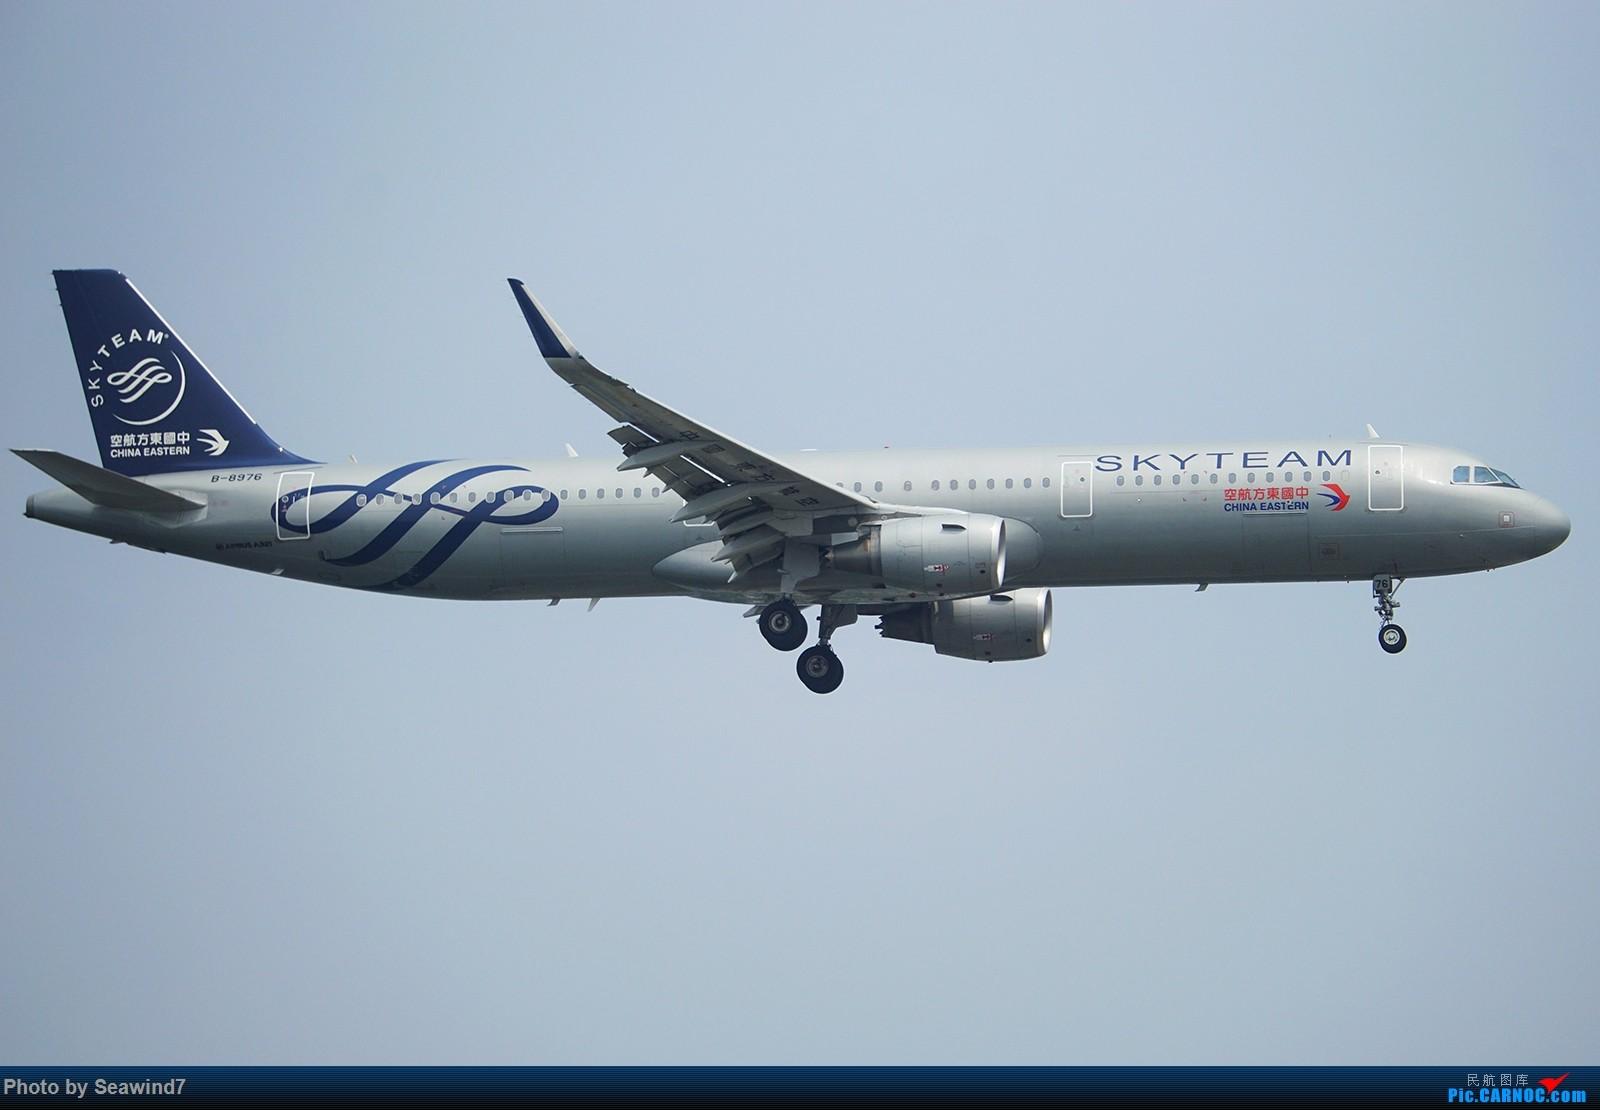 Re:[原创]新手的五一假期(含玩具总动员) AIRBUS A321-200 B-8976 中国上海虹桥国际机场